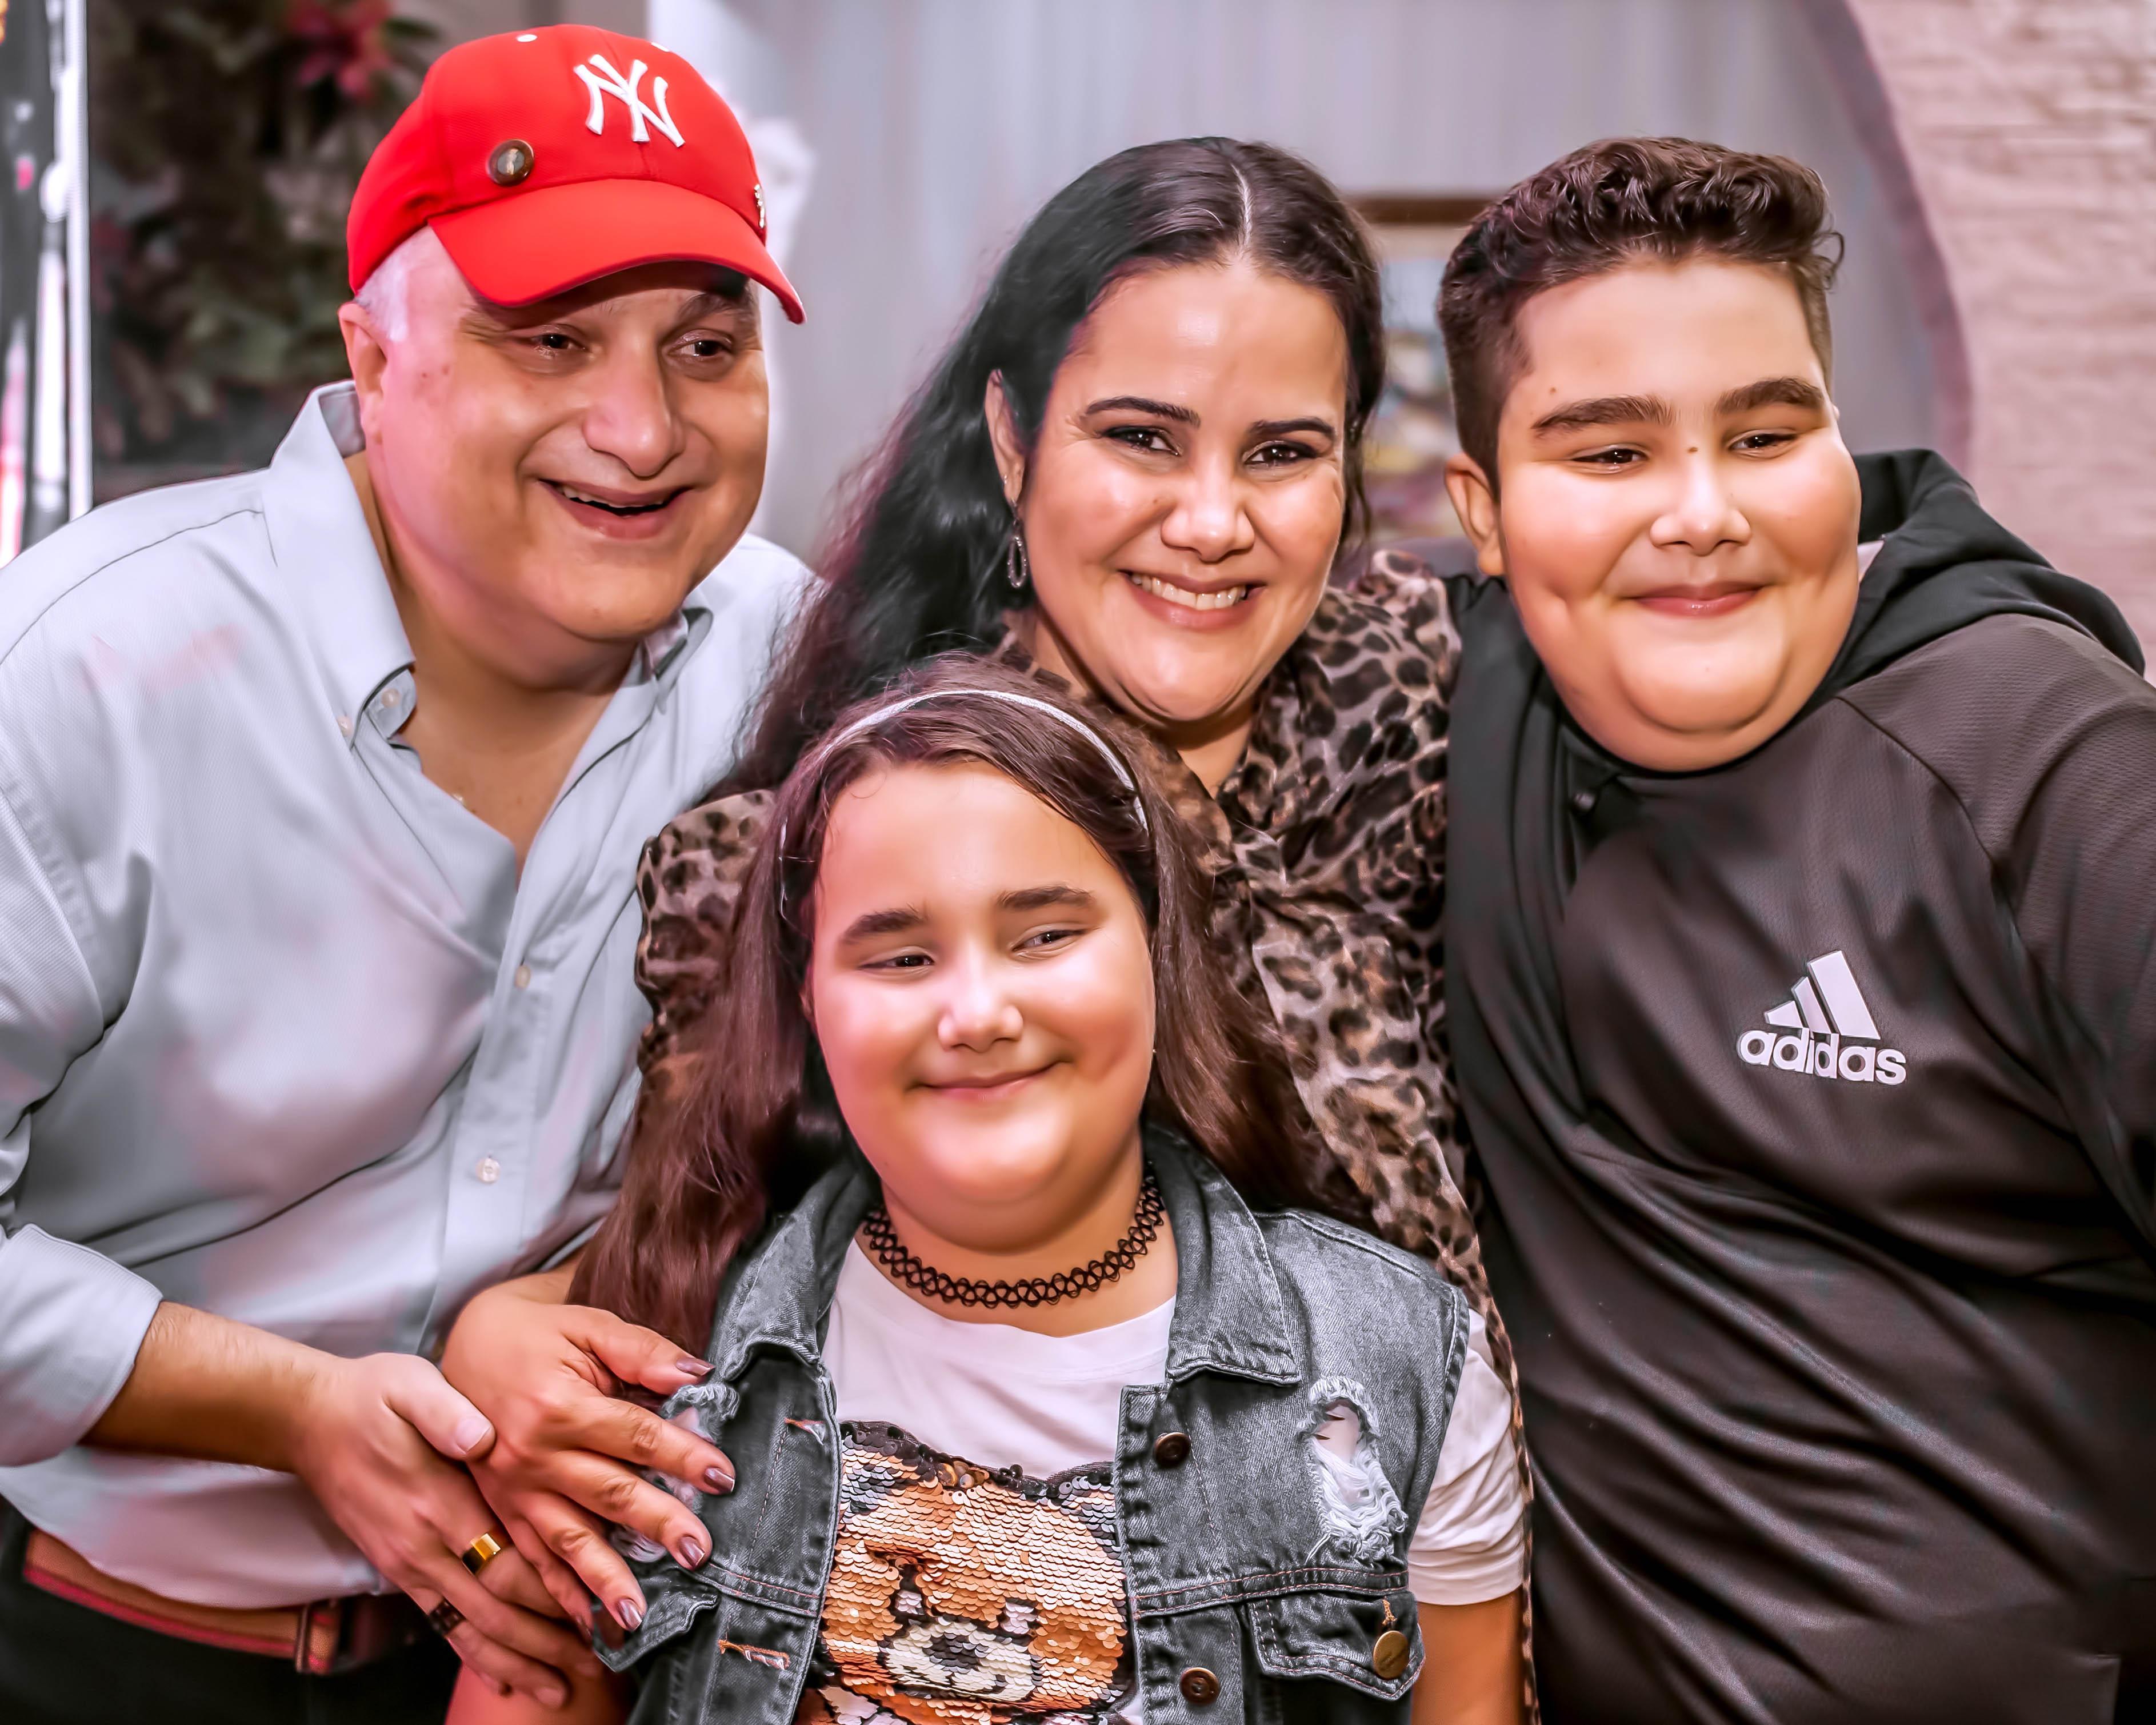 Ramon, a esposa Flávia e os filhos na noite da Ópera. Fotos: Rodger Savaris